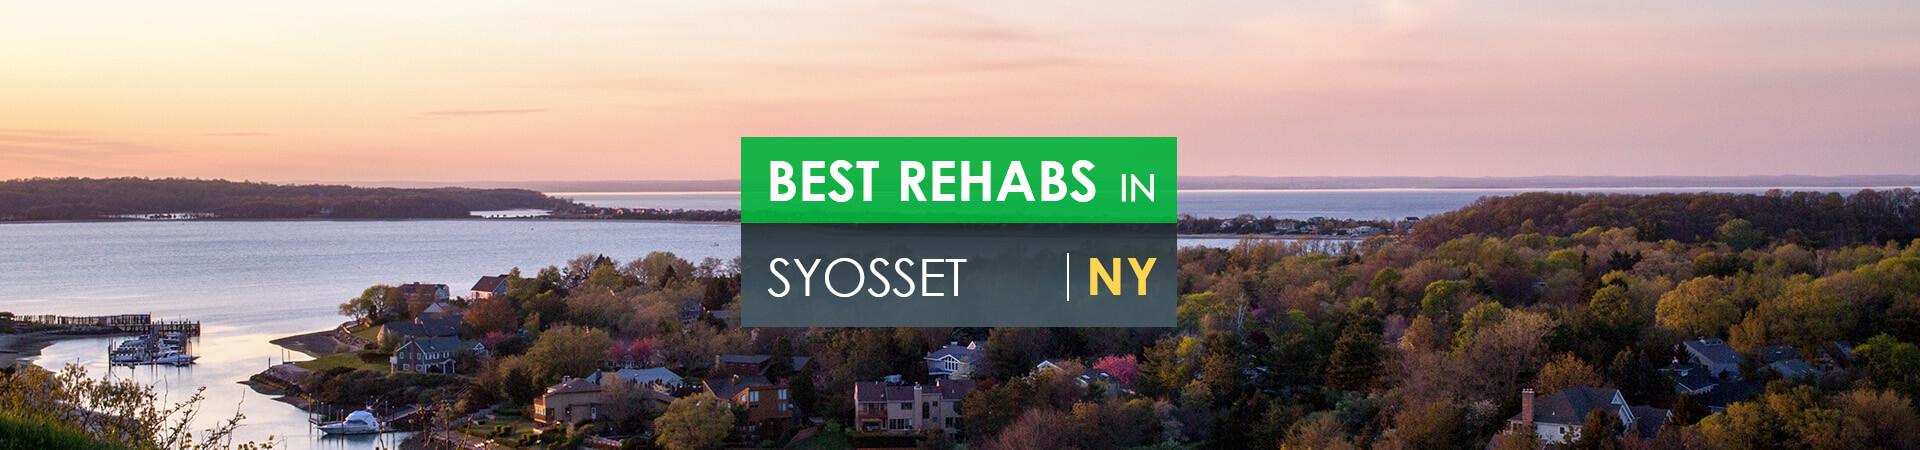 Best rehabs in Syosset, NY